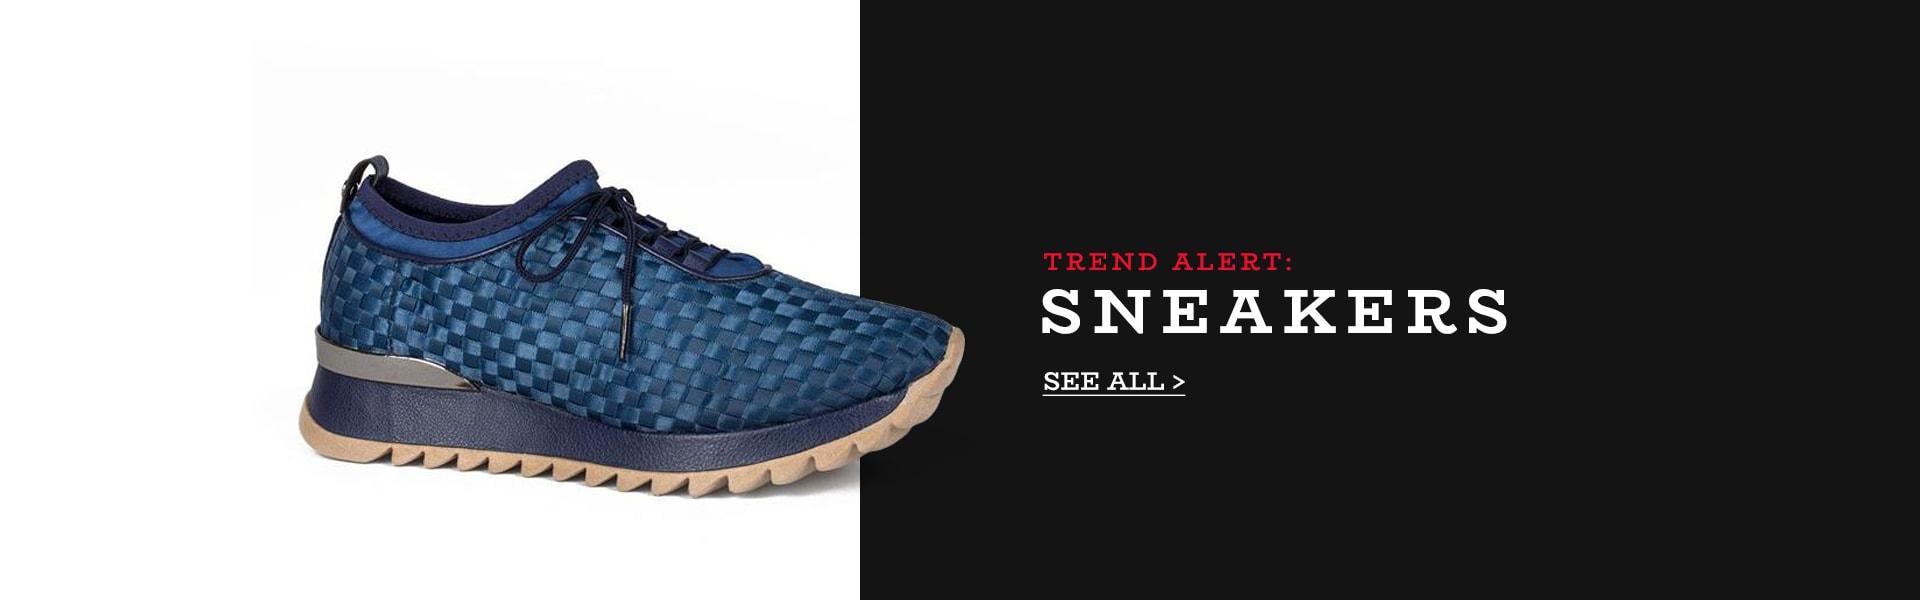 Trend Alert: Sneakers